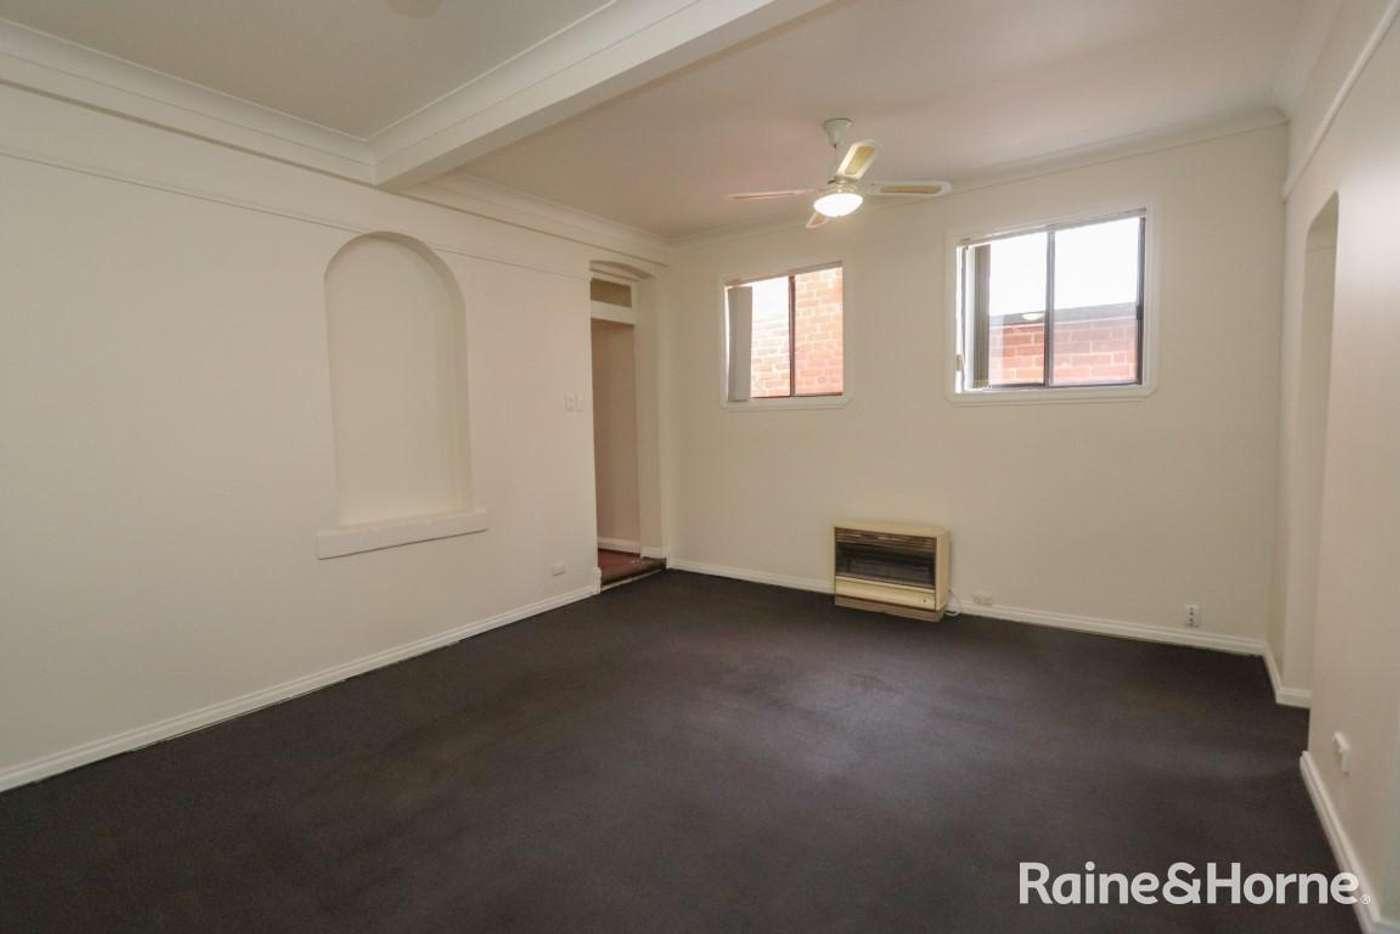 Sixth view of Homely house listing, 27 Morrissett, Bathurst NSW 2795